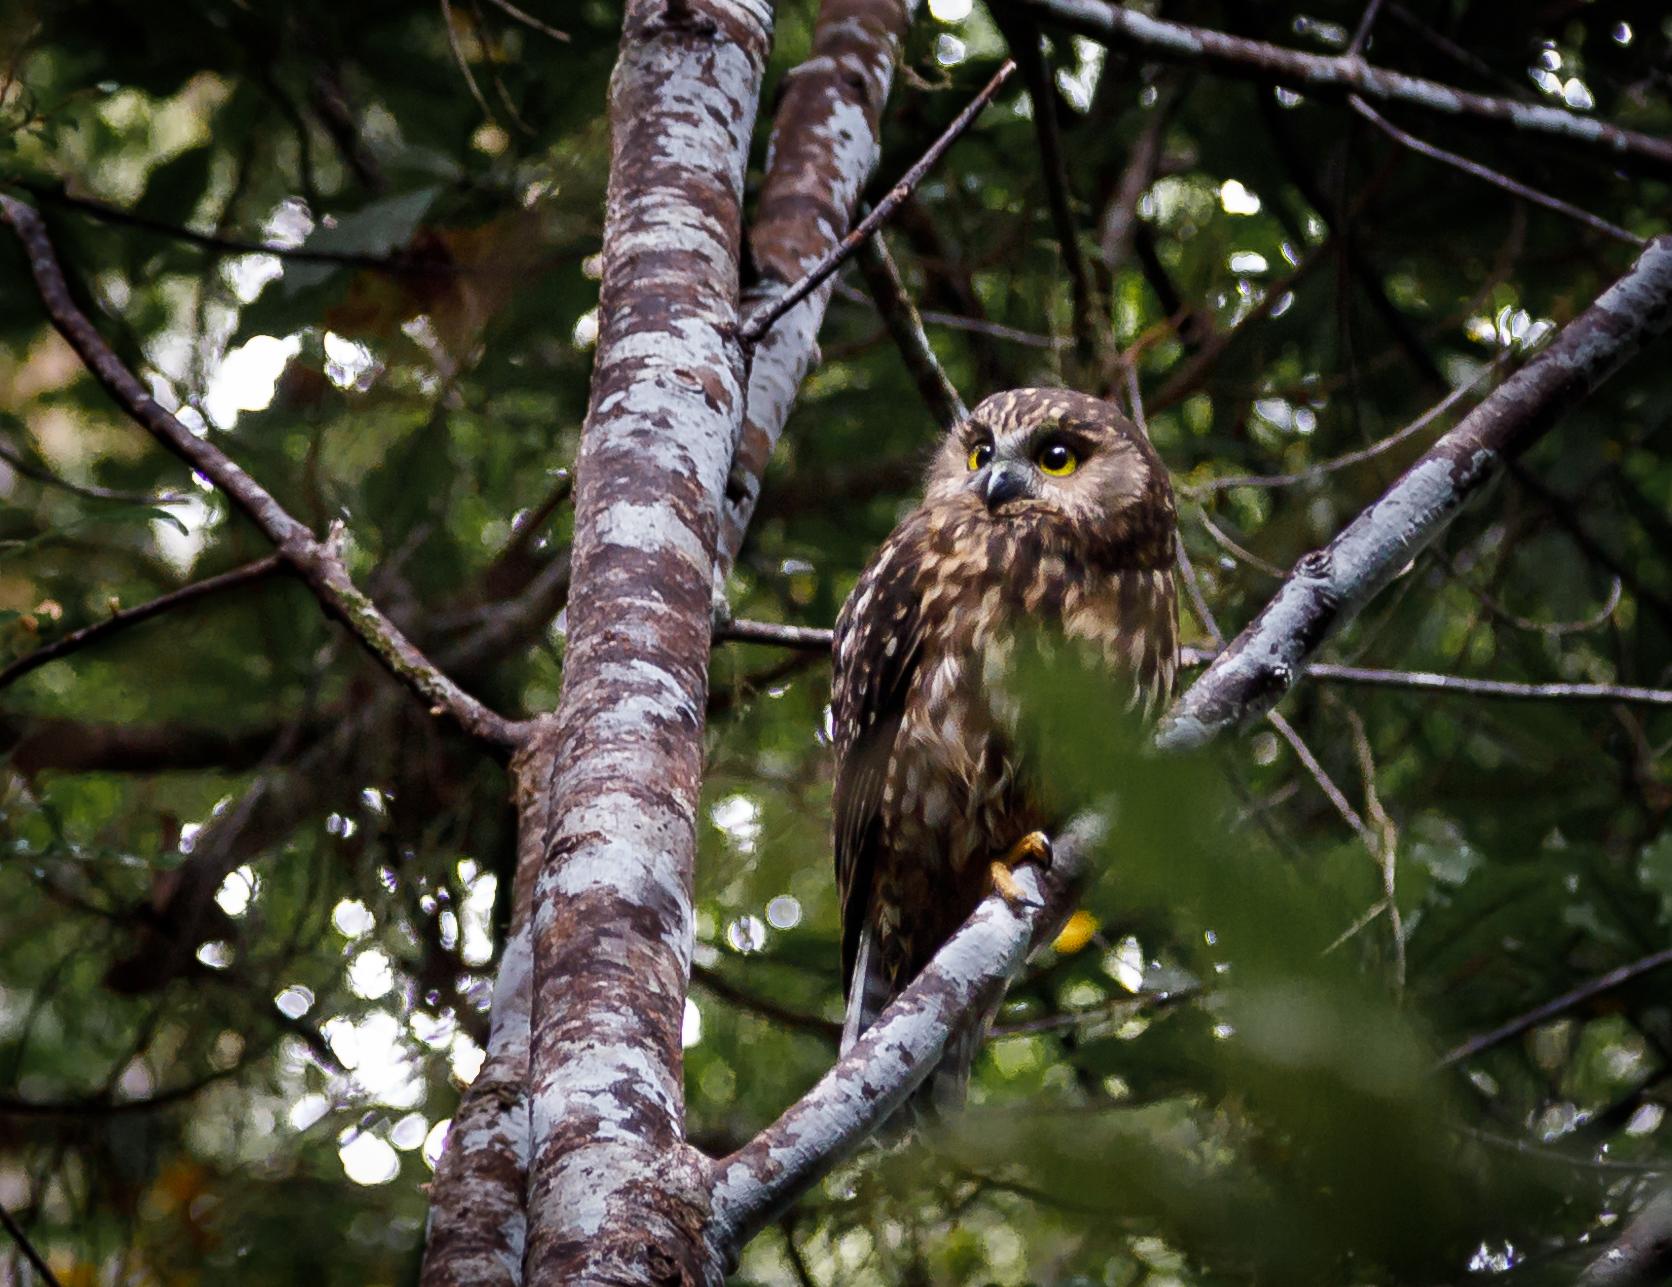 Morepork or Ruru: an owl native to New Zealand